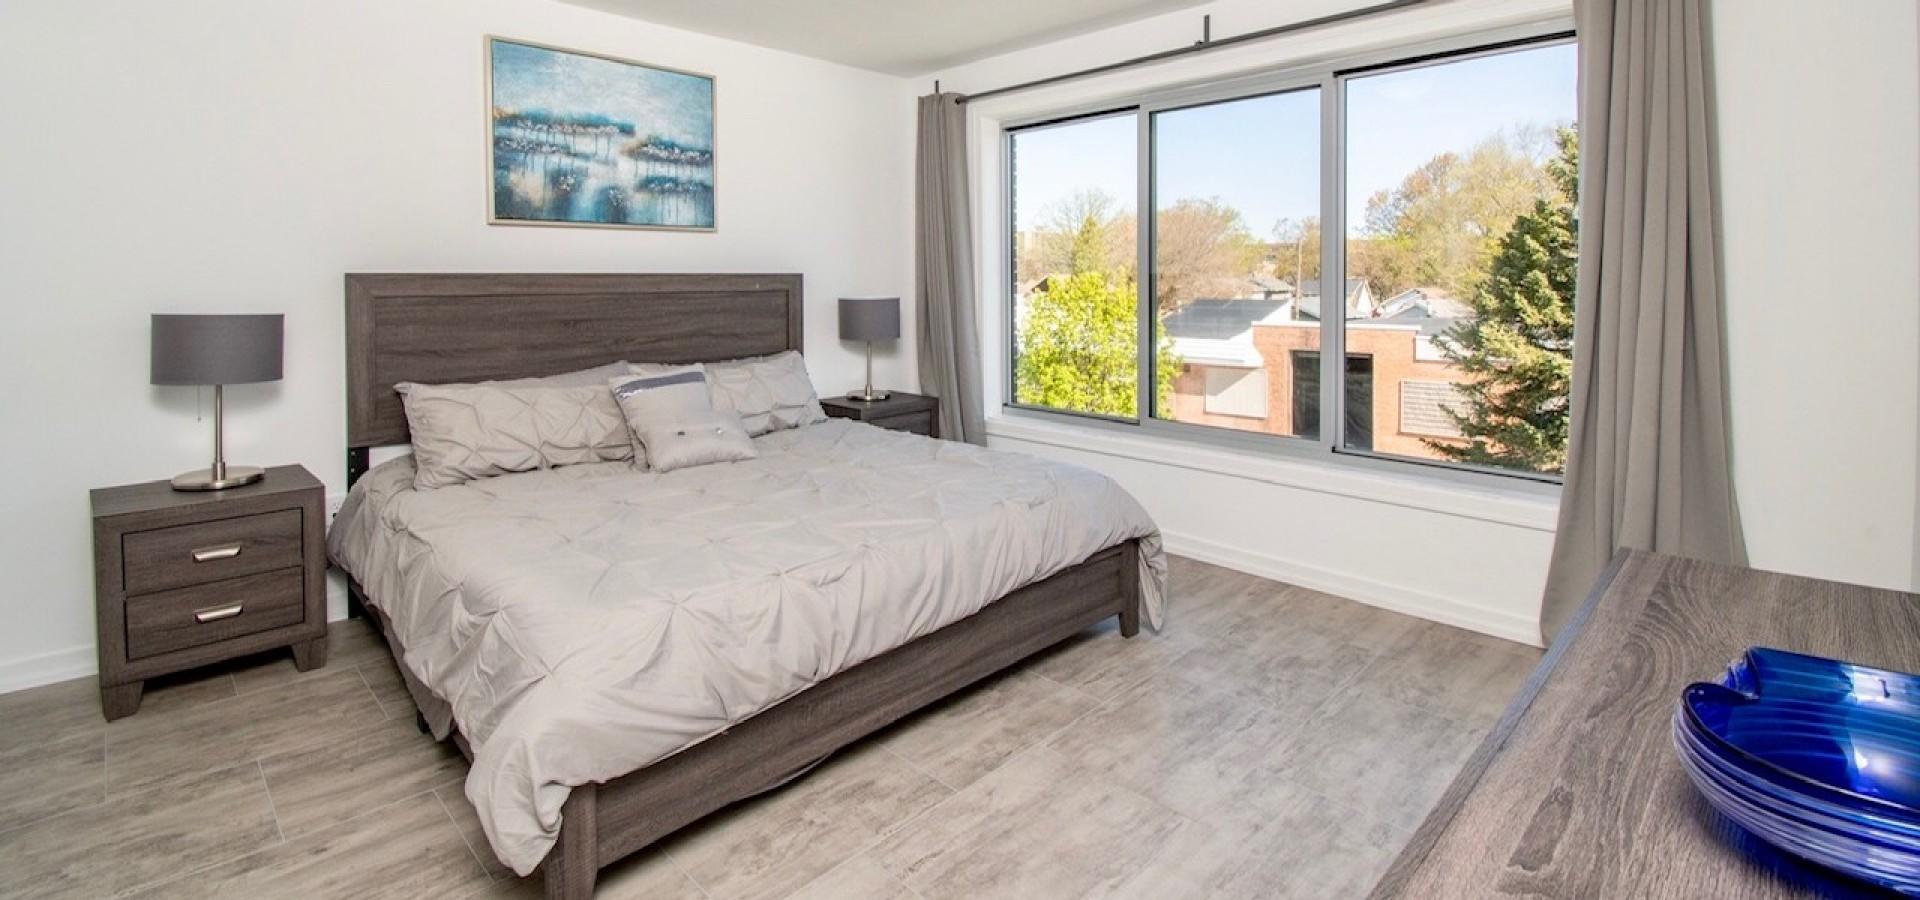 Live Well Master Bedroom Suites